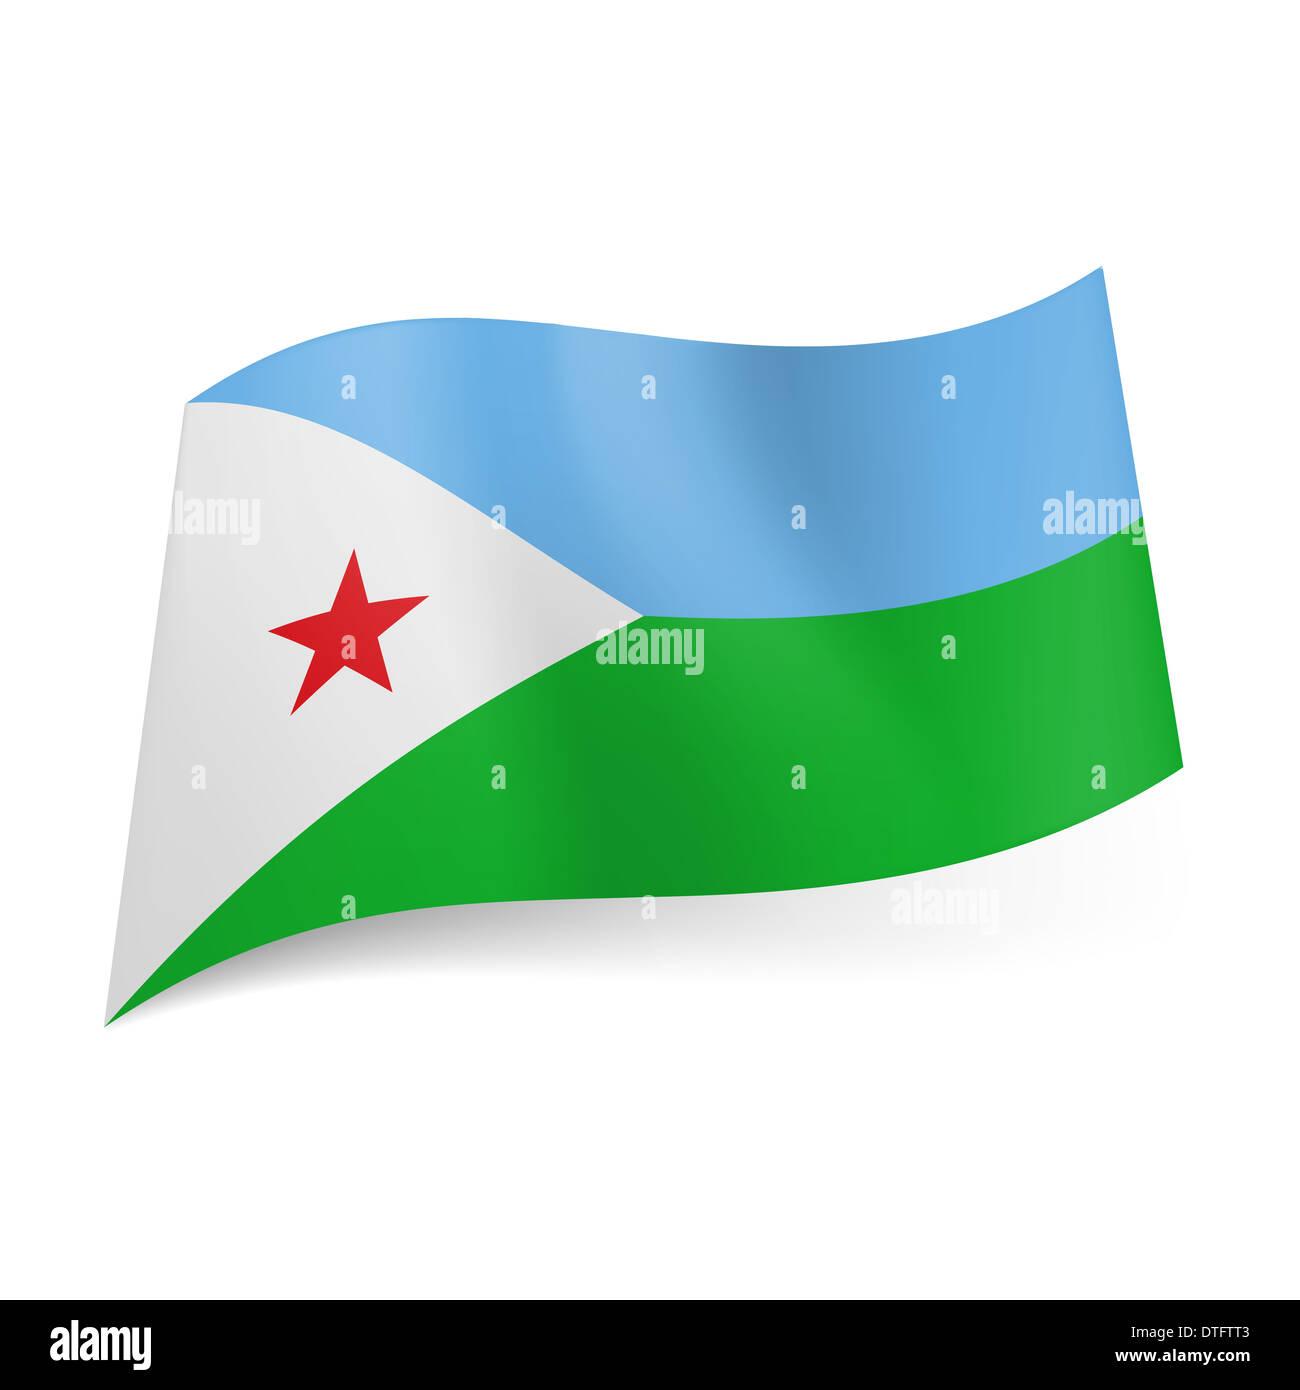 National Flag Of Djibouti Blue And Green Horizontal Stripes White